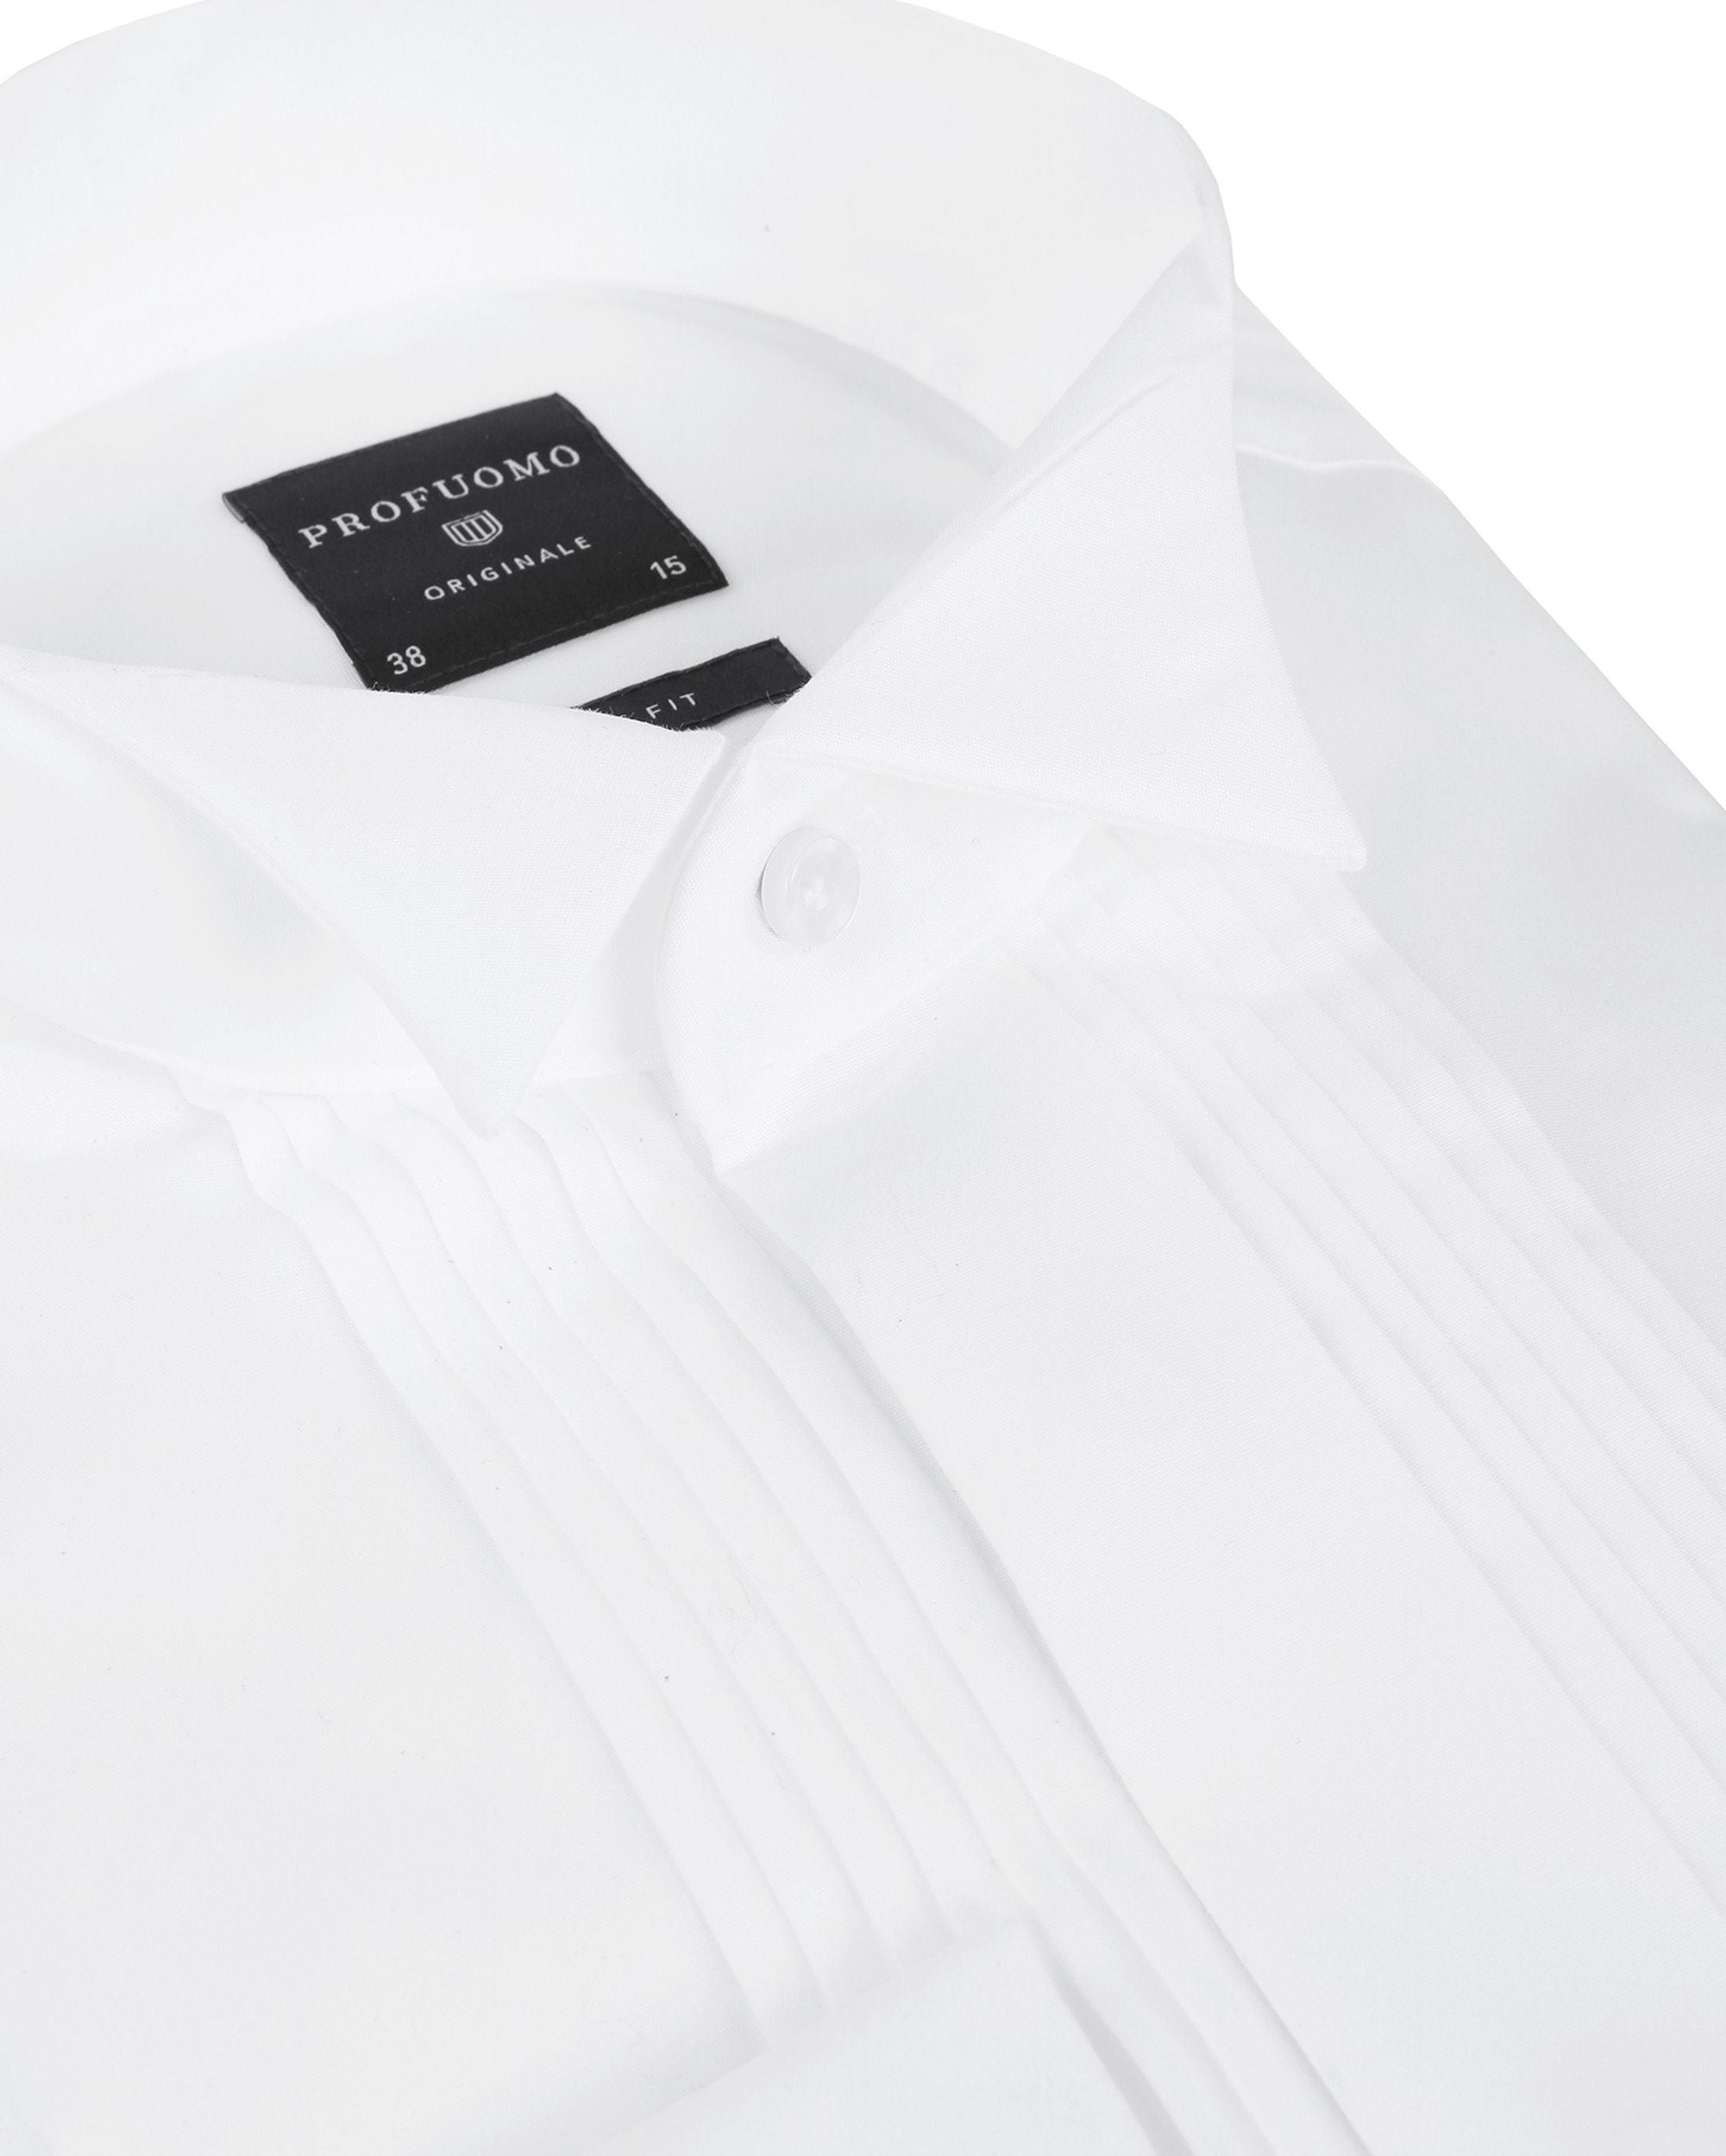 Profuomo Tuxedo Shirt Pleated Slim Fit White